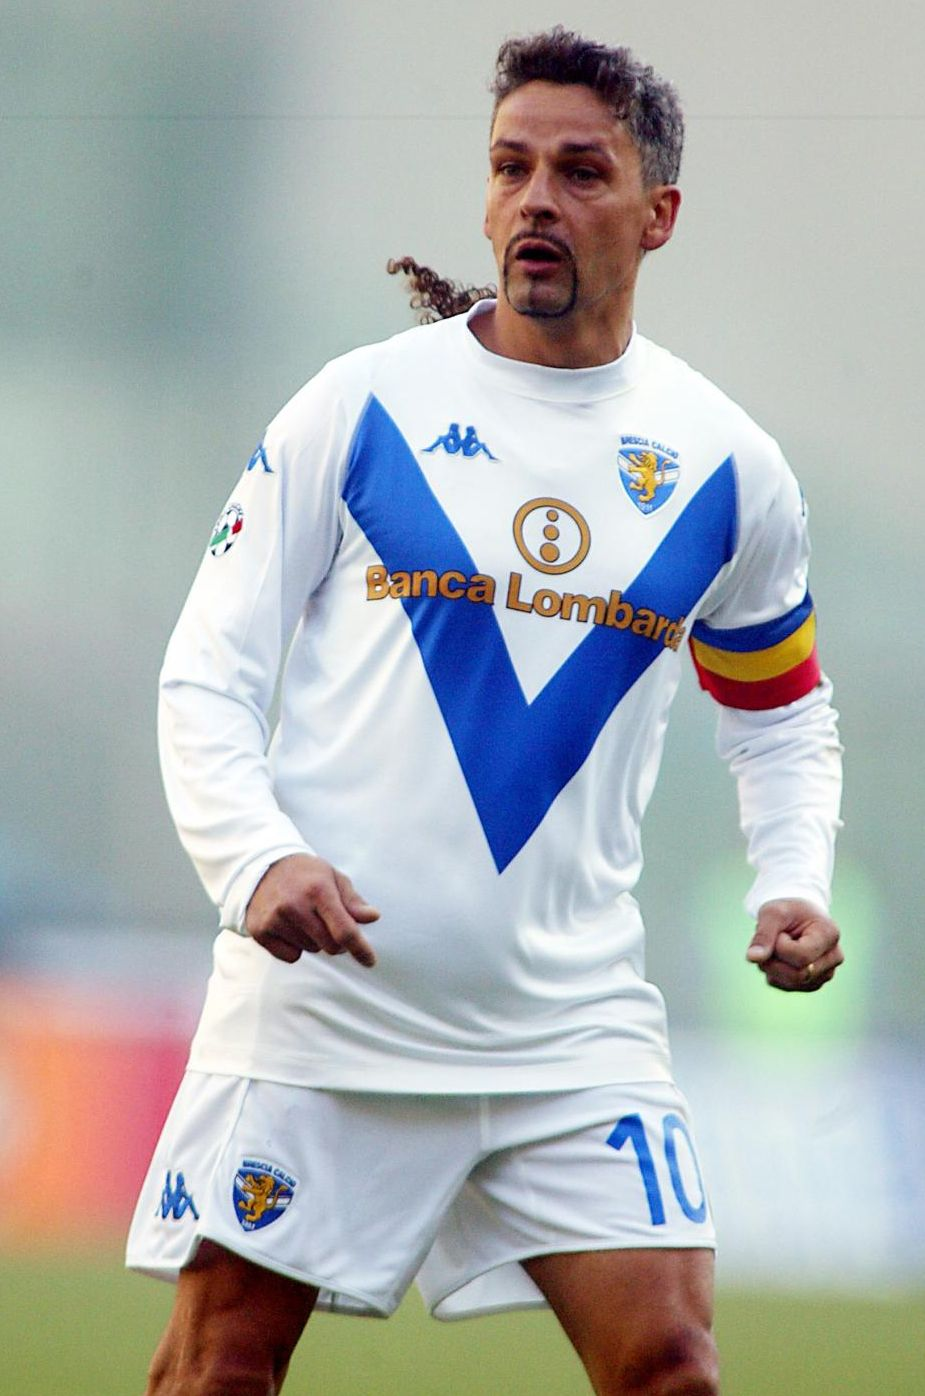 брутальный фото футболиста роберто баджо трал